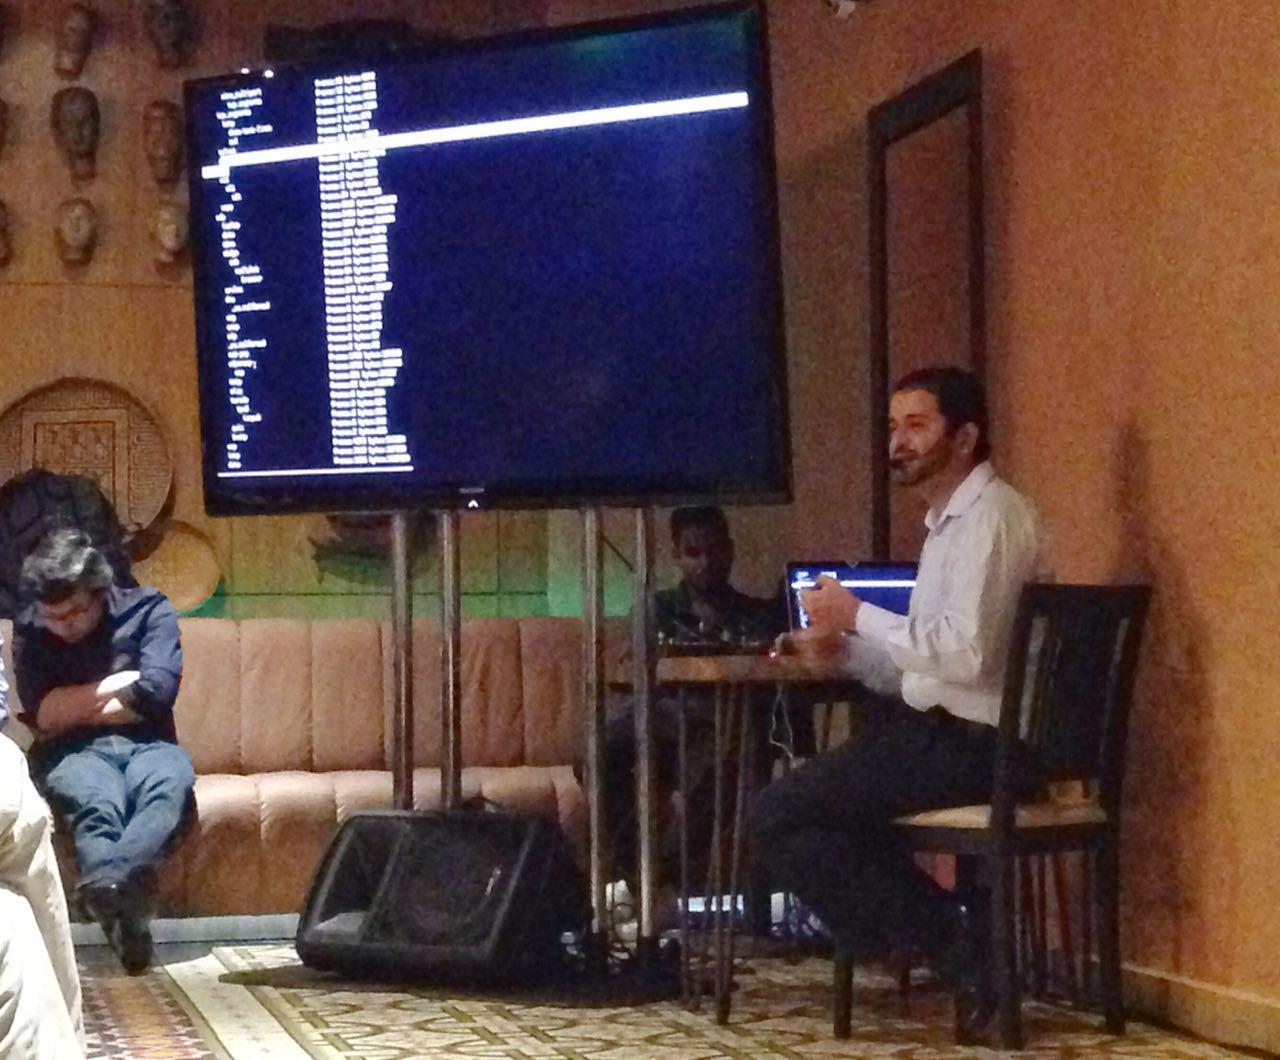 Rafael Silva apresentou palestra sobre arquivos pcap